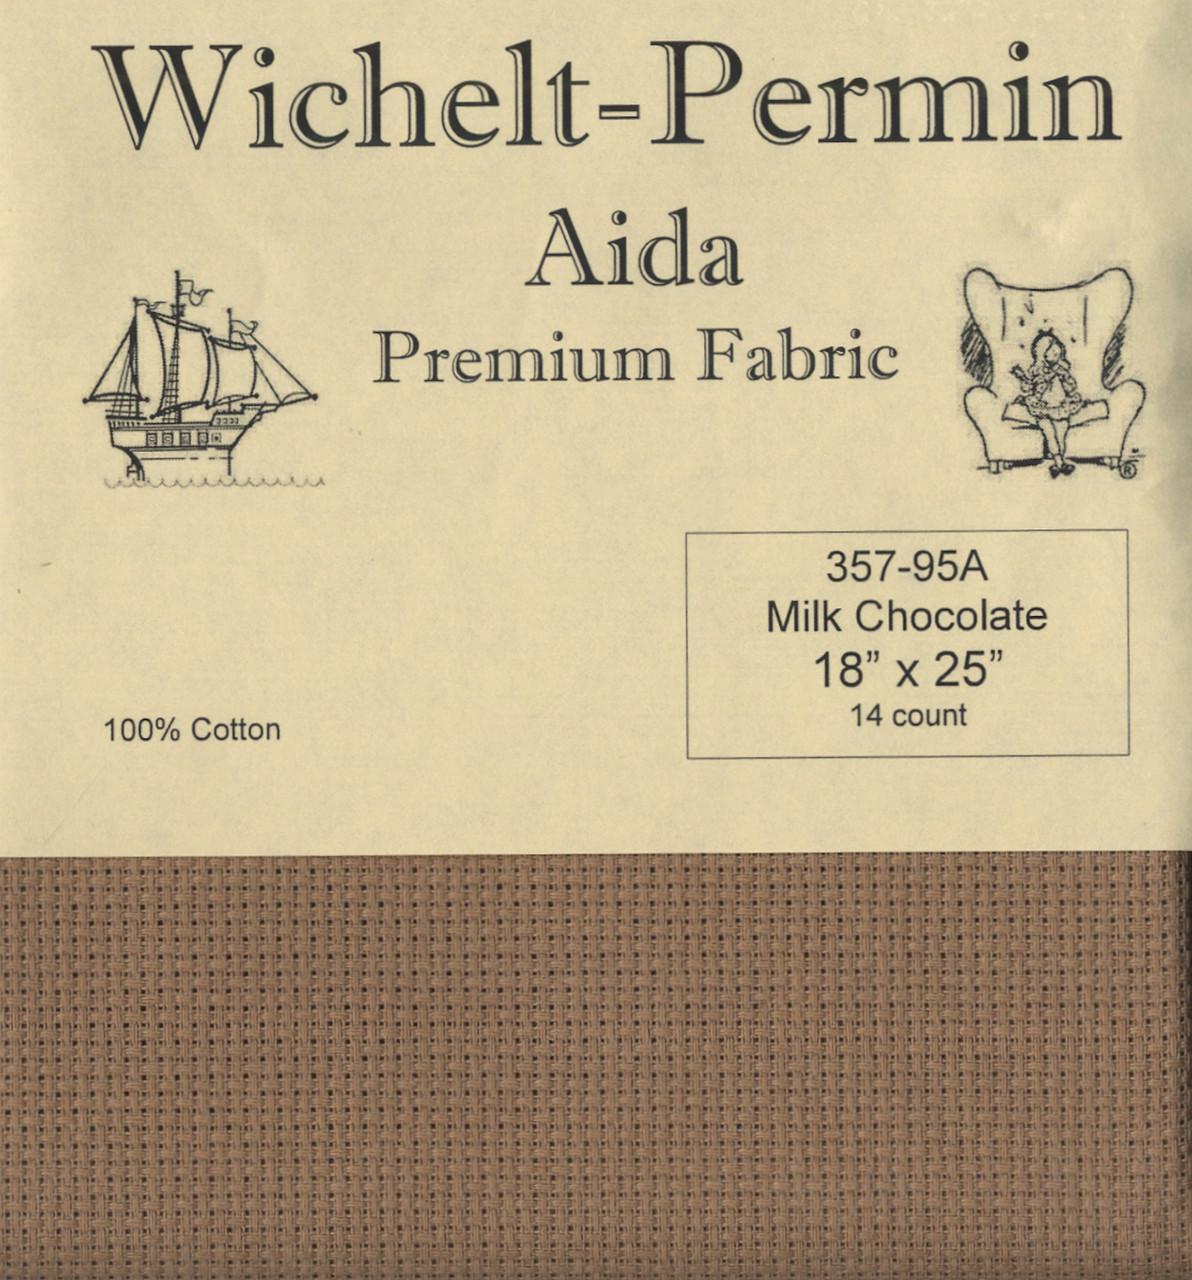 Wichelt - 14 Ct Milk Chocolate Aida 18 x 25 in